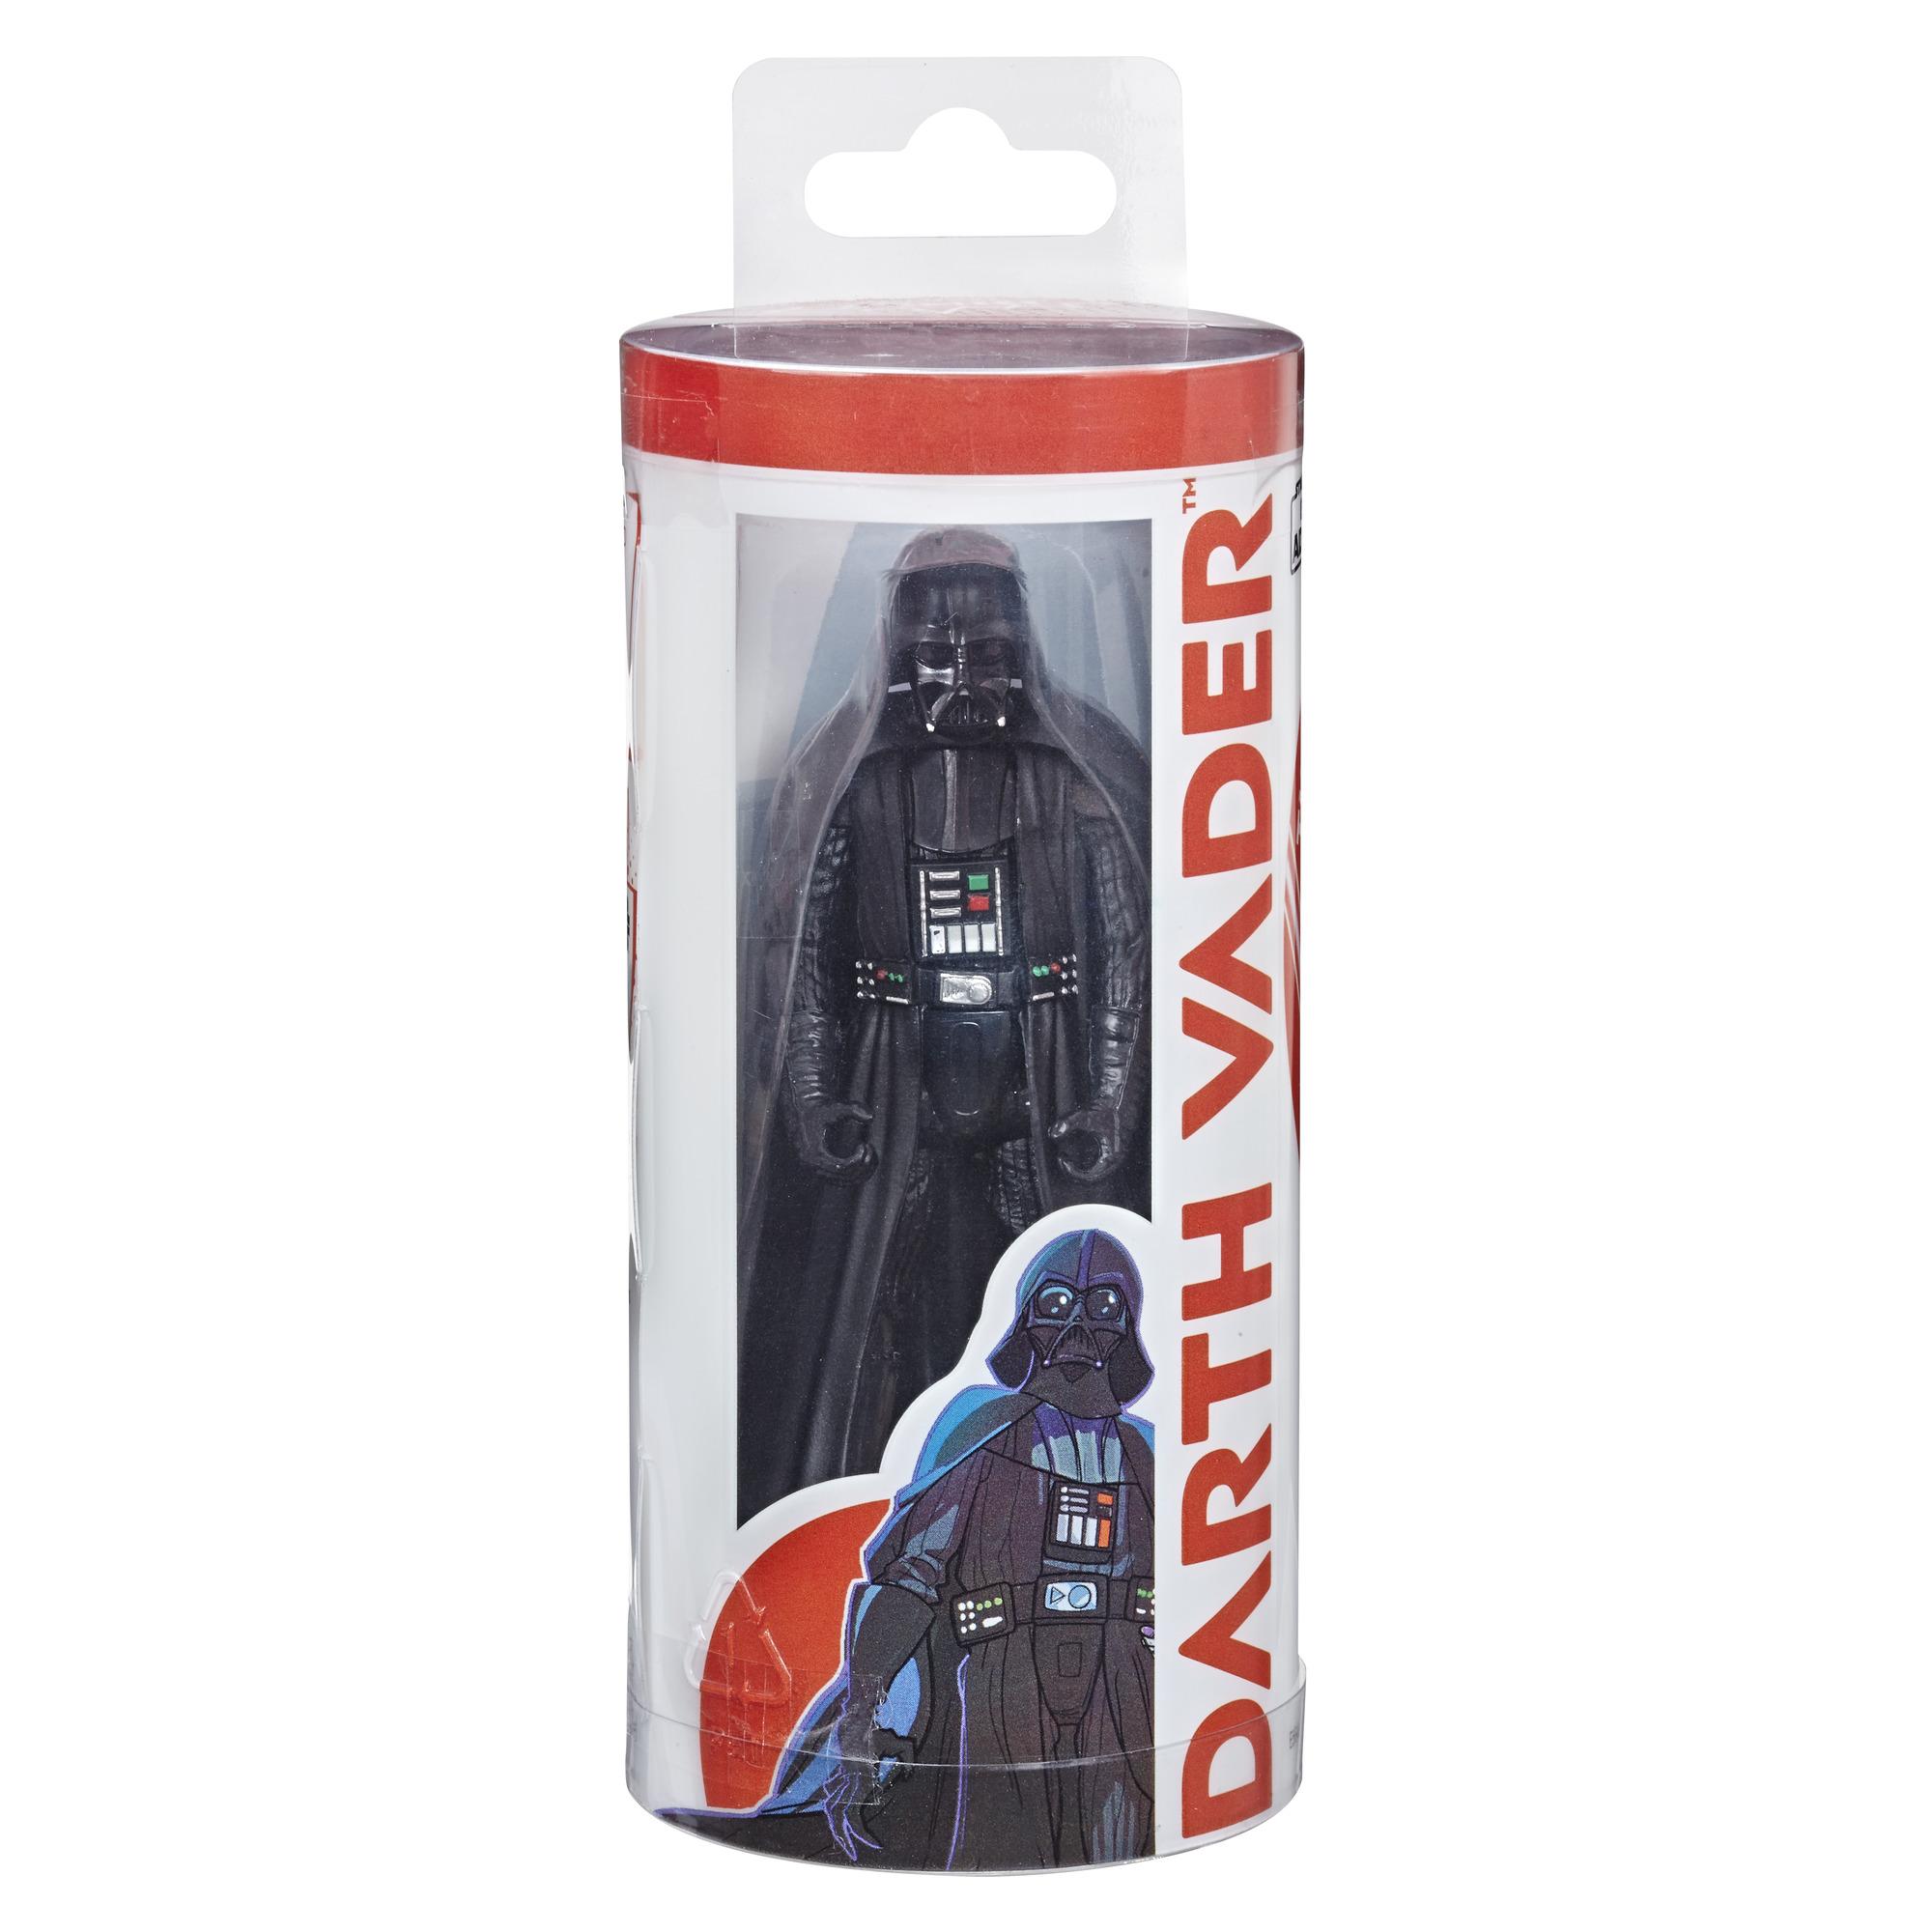 SW Galaxy of Adventures Darth Vader Figure and Mini Comic Set 1